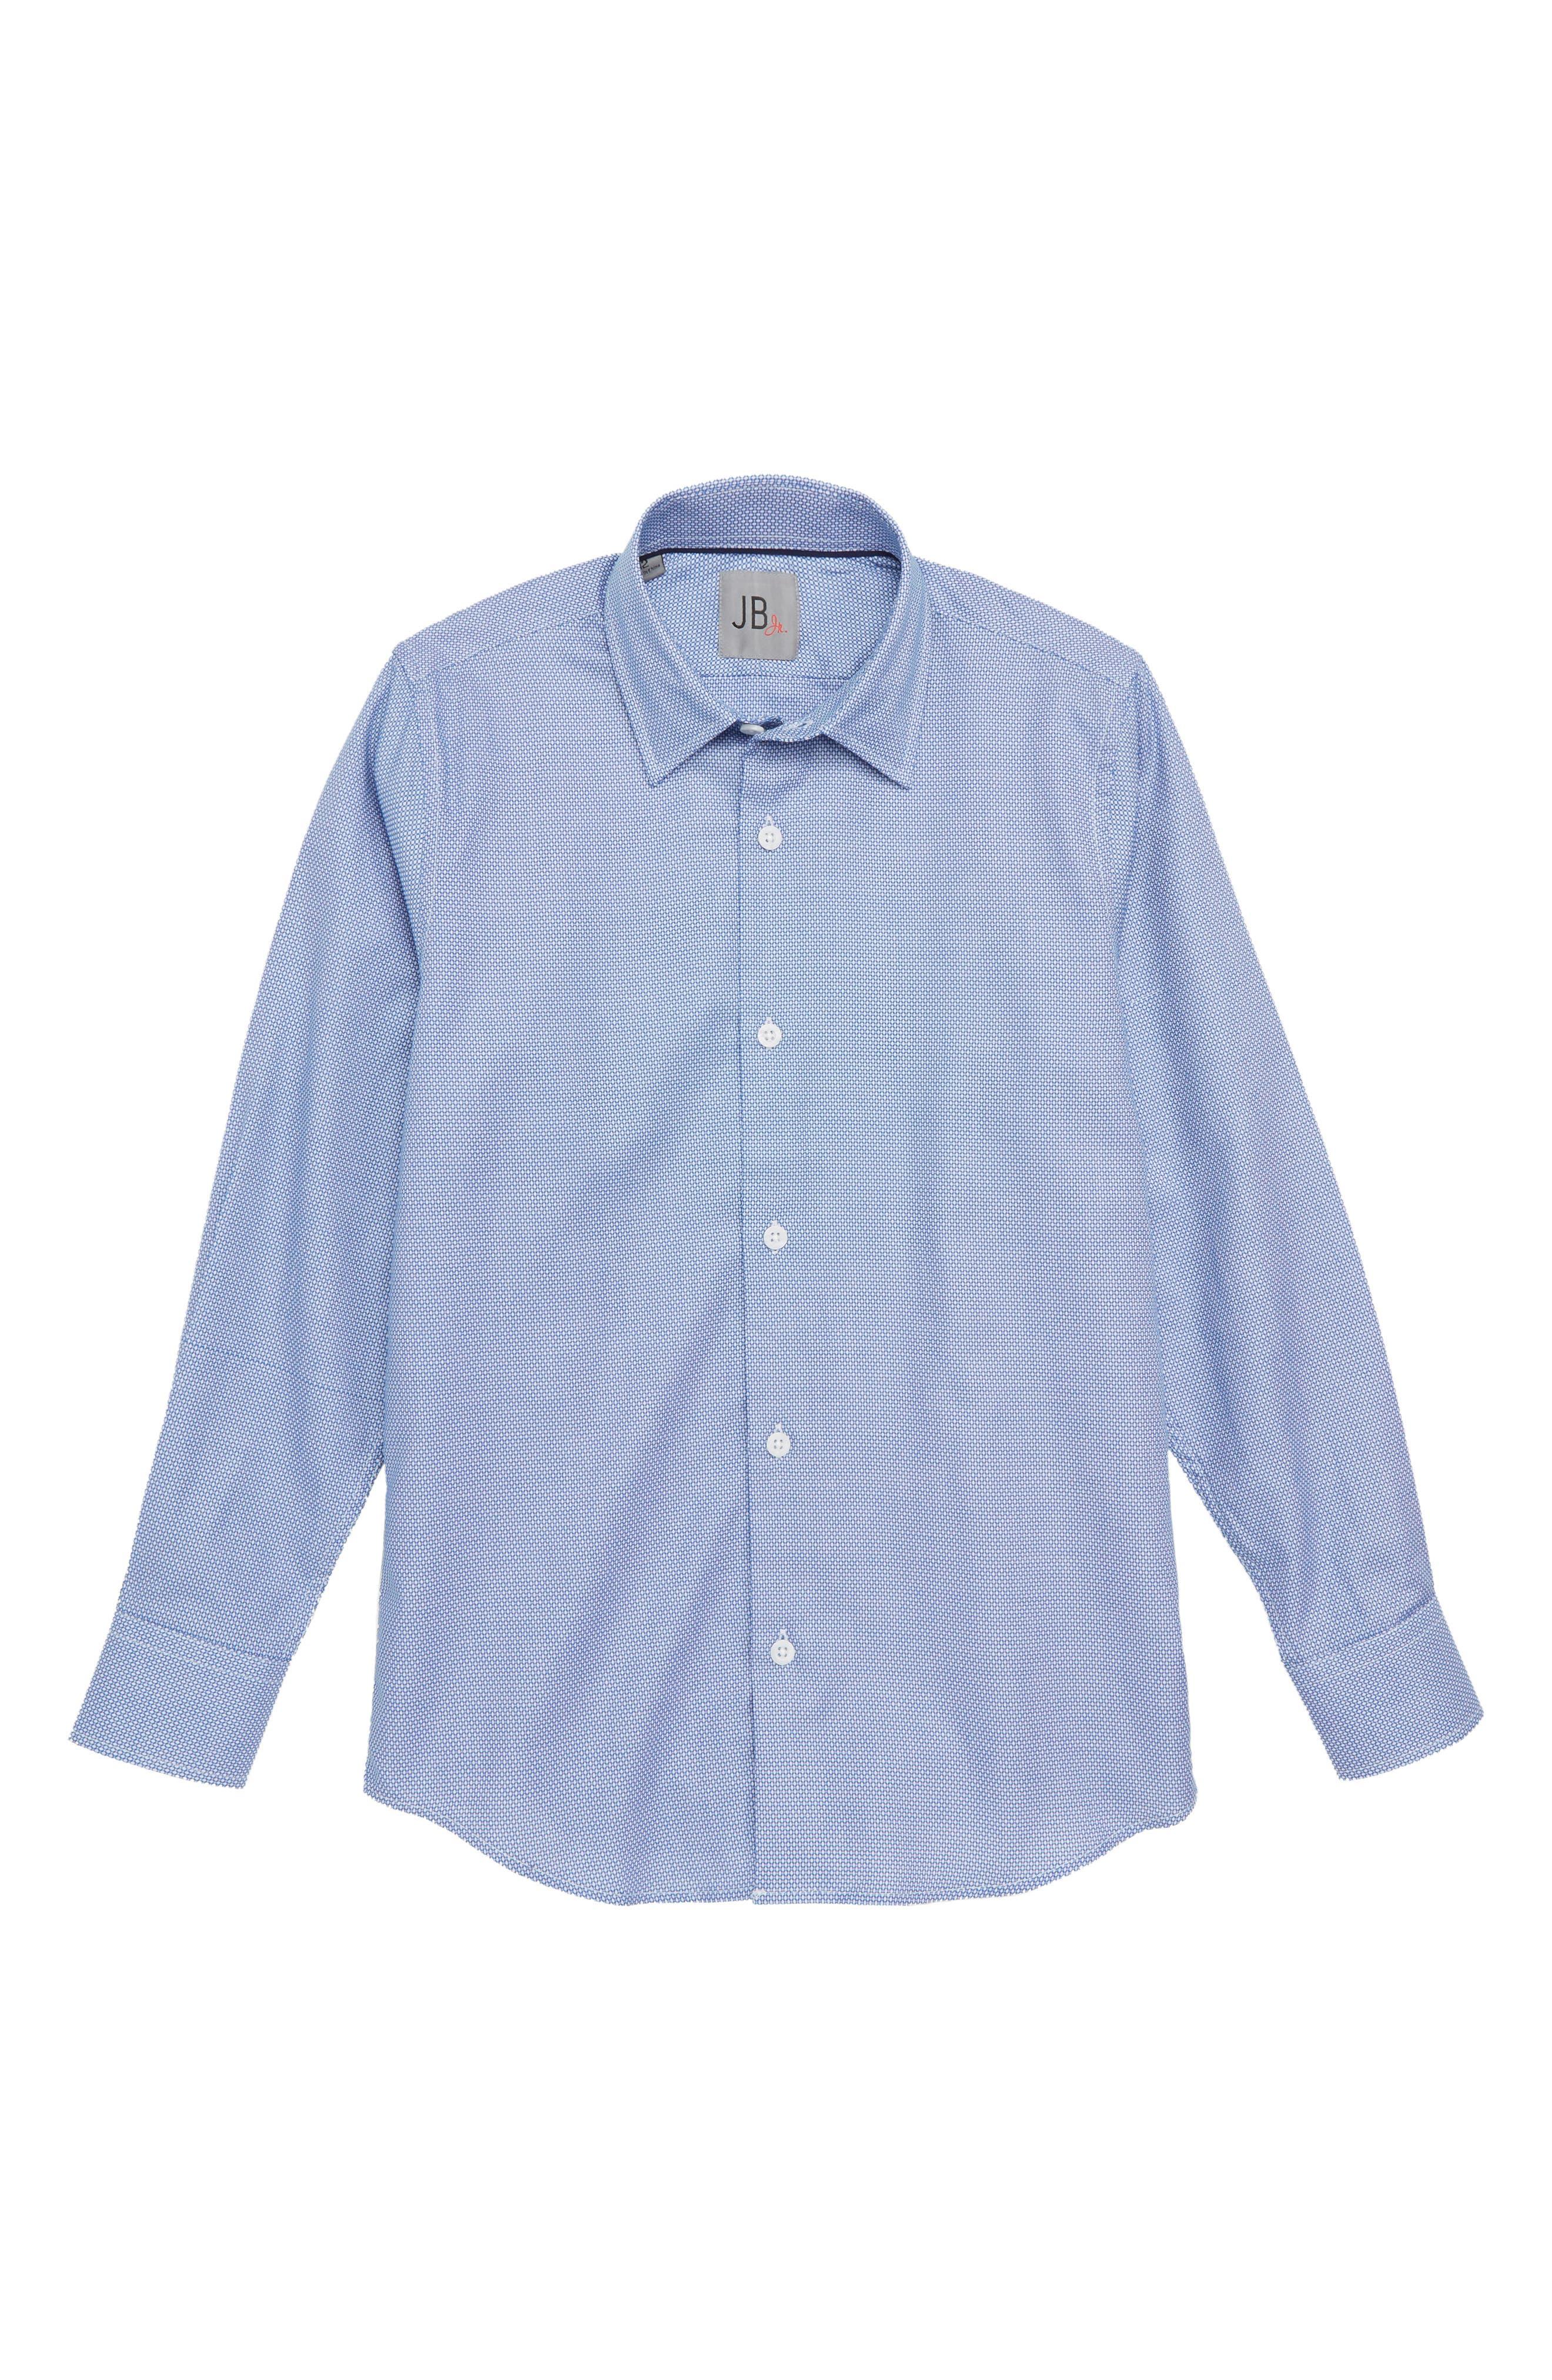 Print Dress Shirt,                             Main thumbnail 1, color,                             Blue